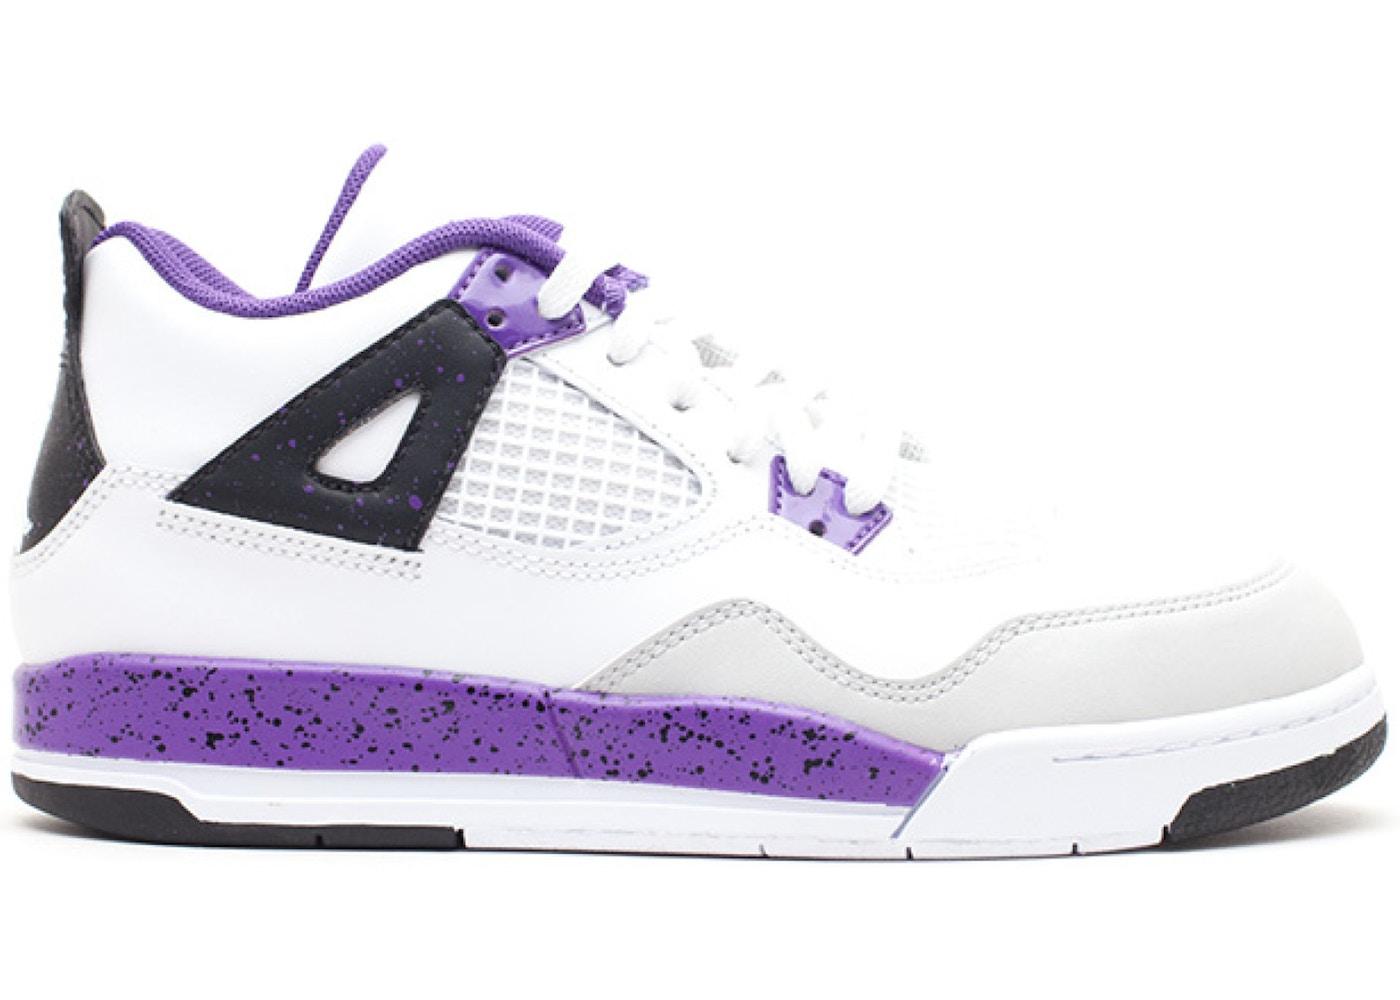 Jordan 4 Retro Ultraviolet (PS)